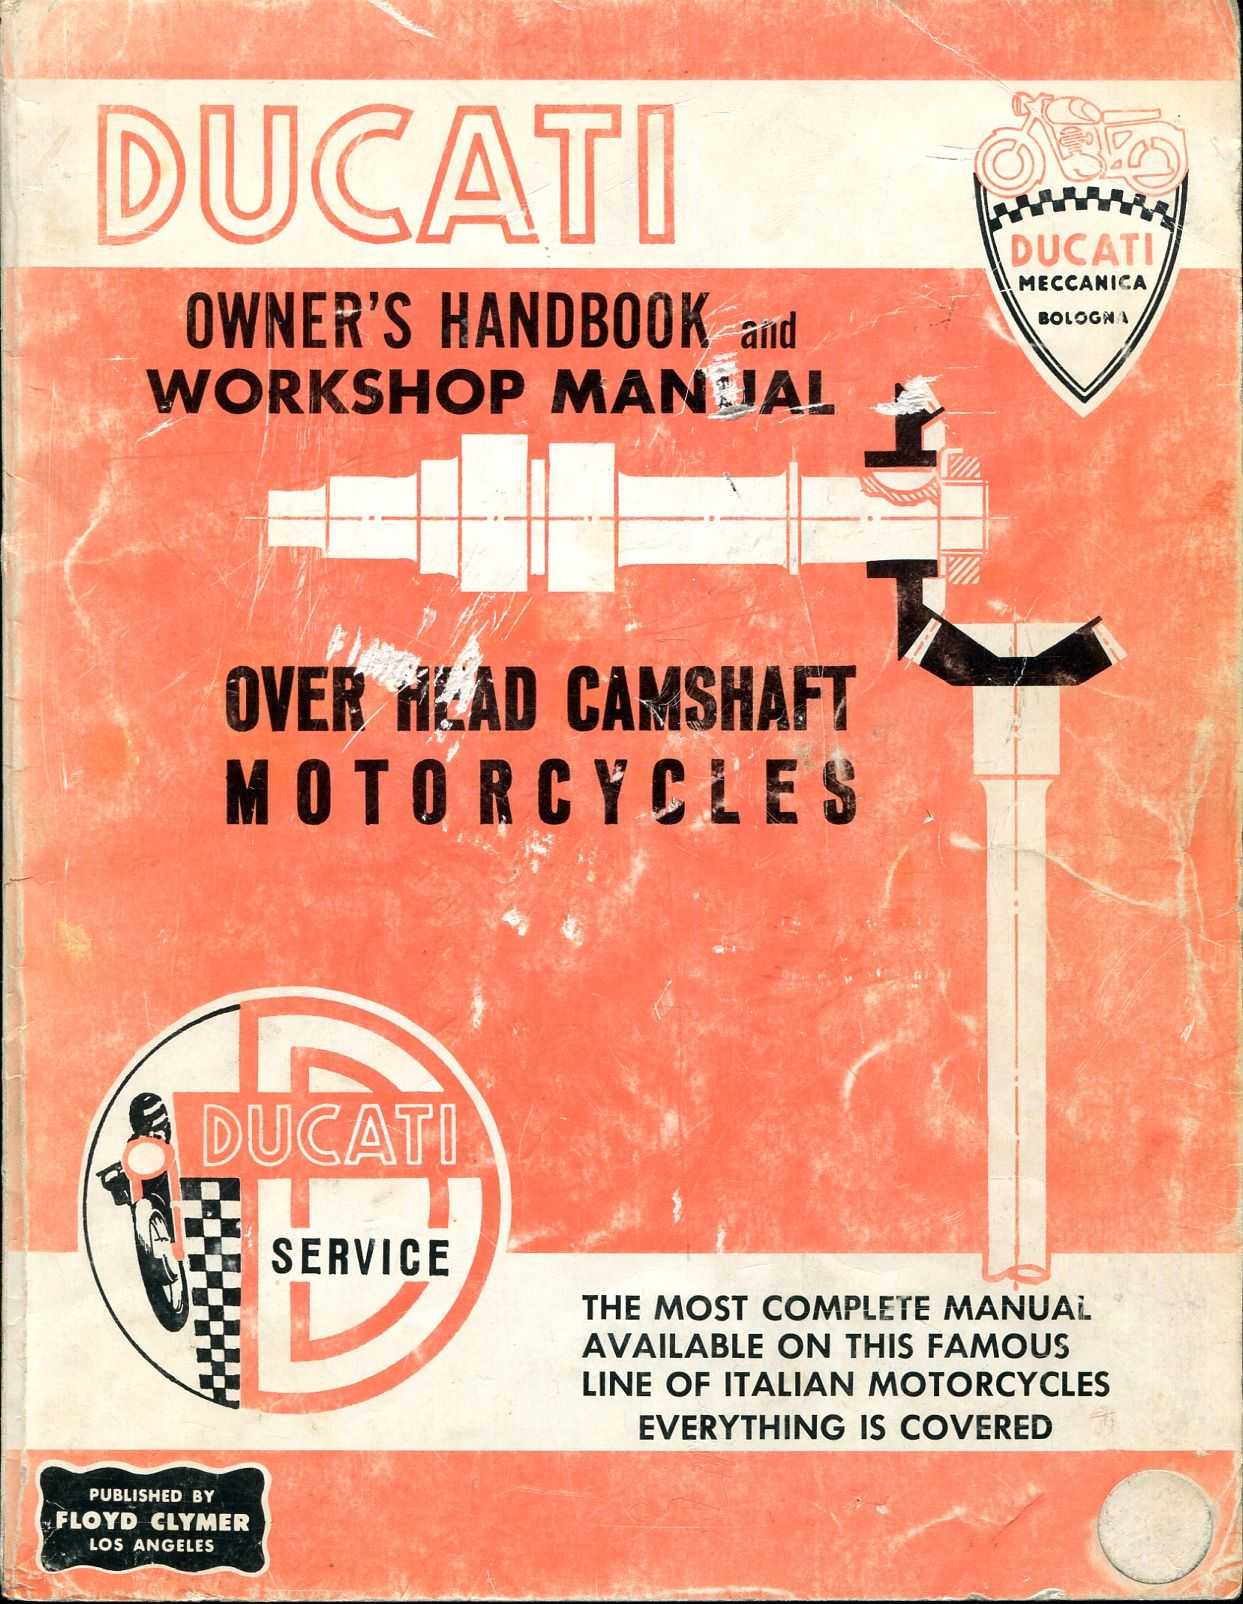 Ducati: Owners Handbook and Workshop Manual - Over Head Camshaft Motorcycles